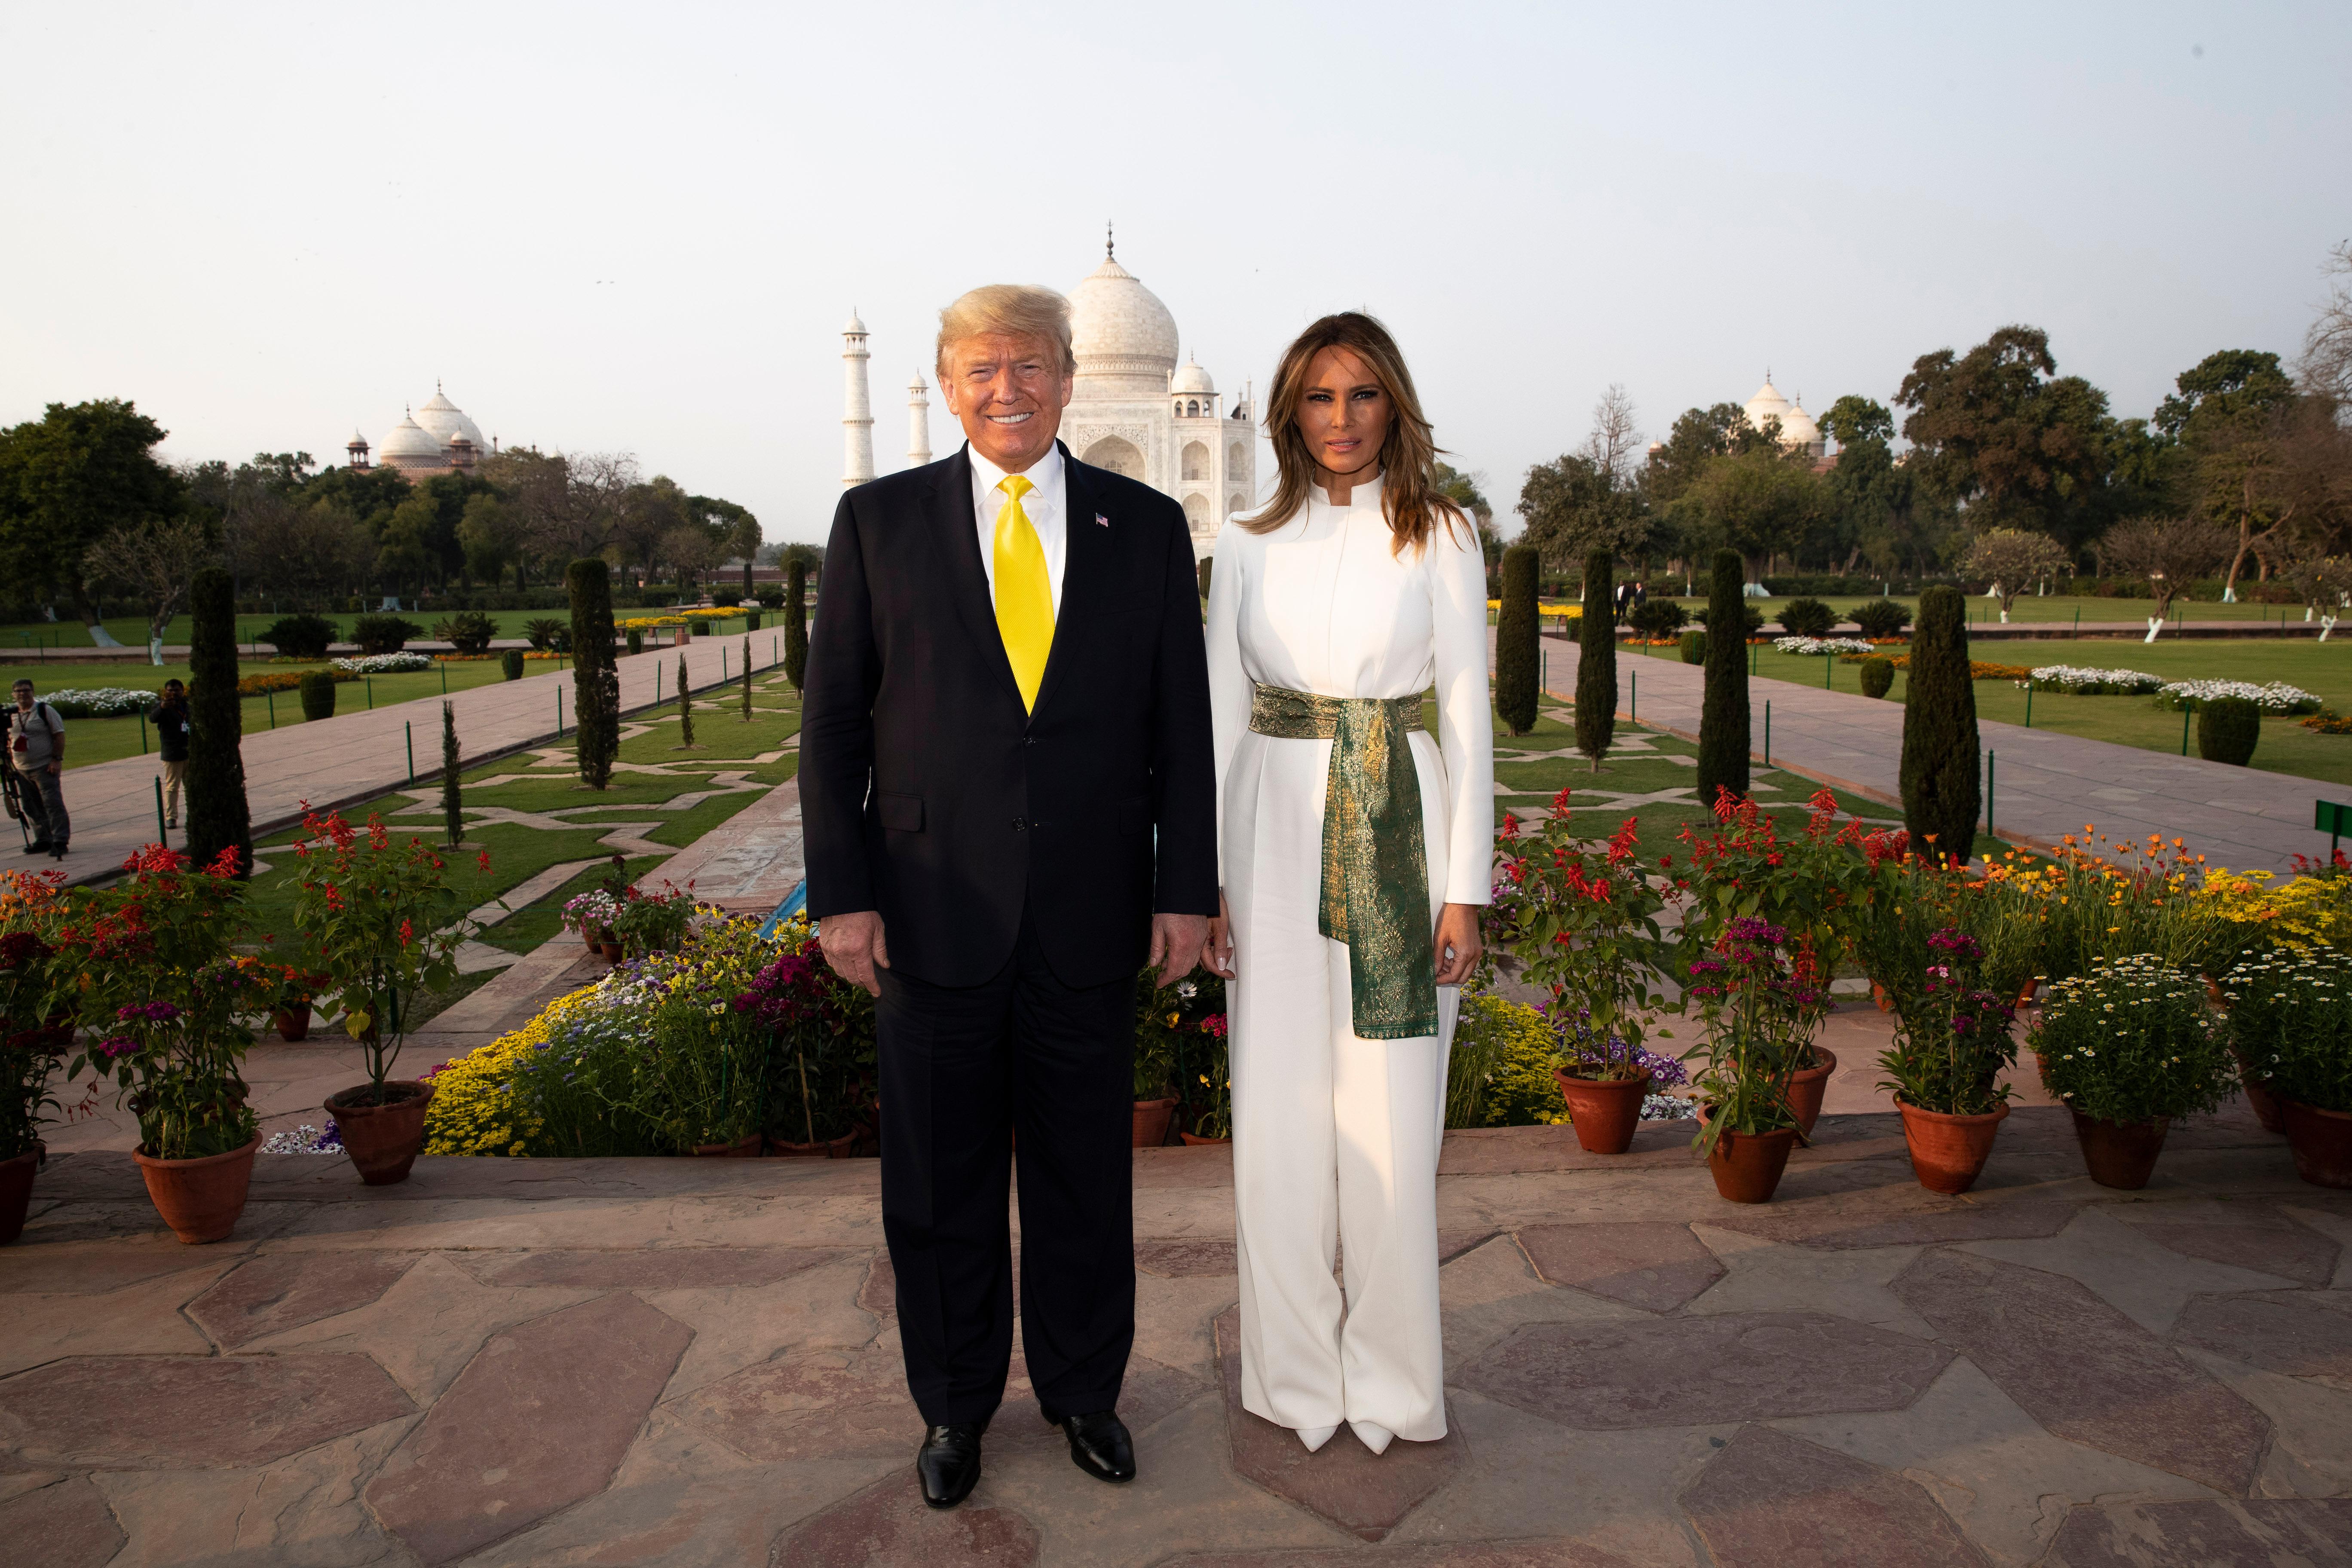 Donald Trump, Melania Trump. President Donald Trump, with first lady Melania Trump, pause as they tour the Taj Mahal, in Agra, IndiaNamaste Trump, Agra, India - 24 Feb 2020